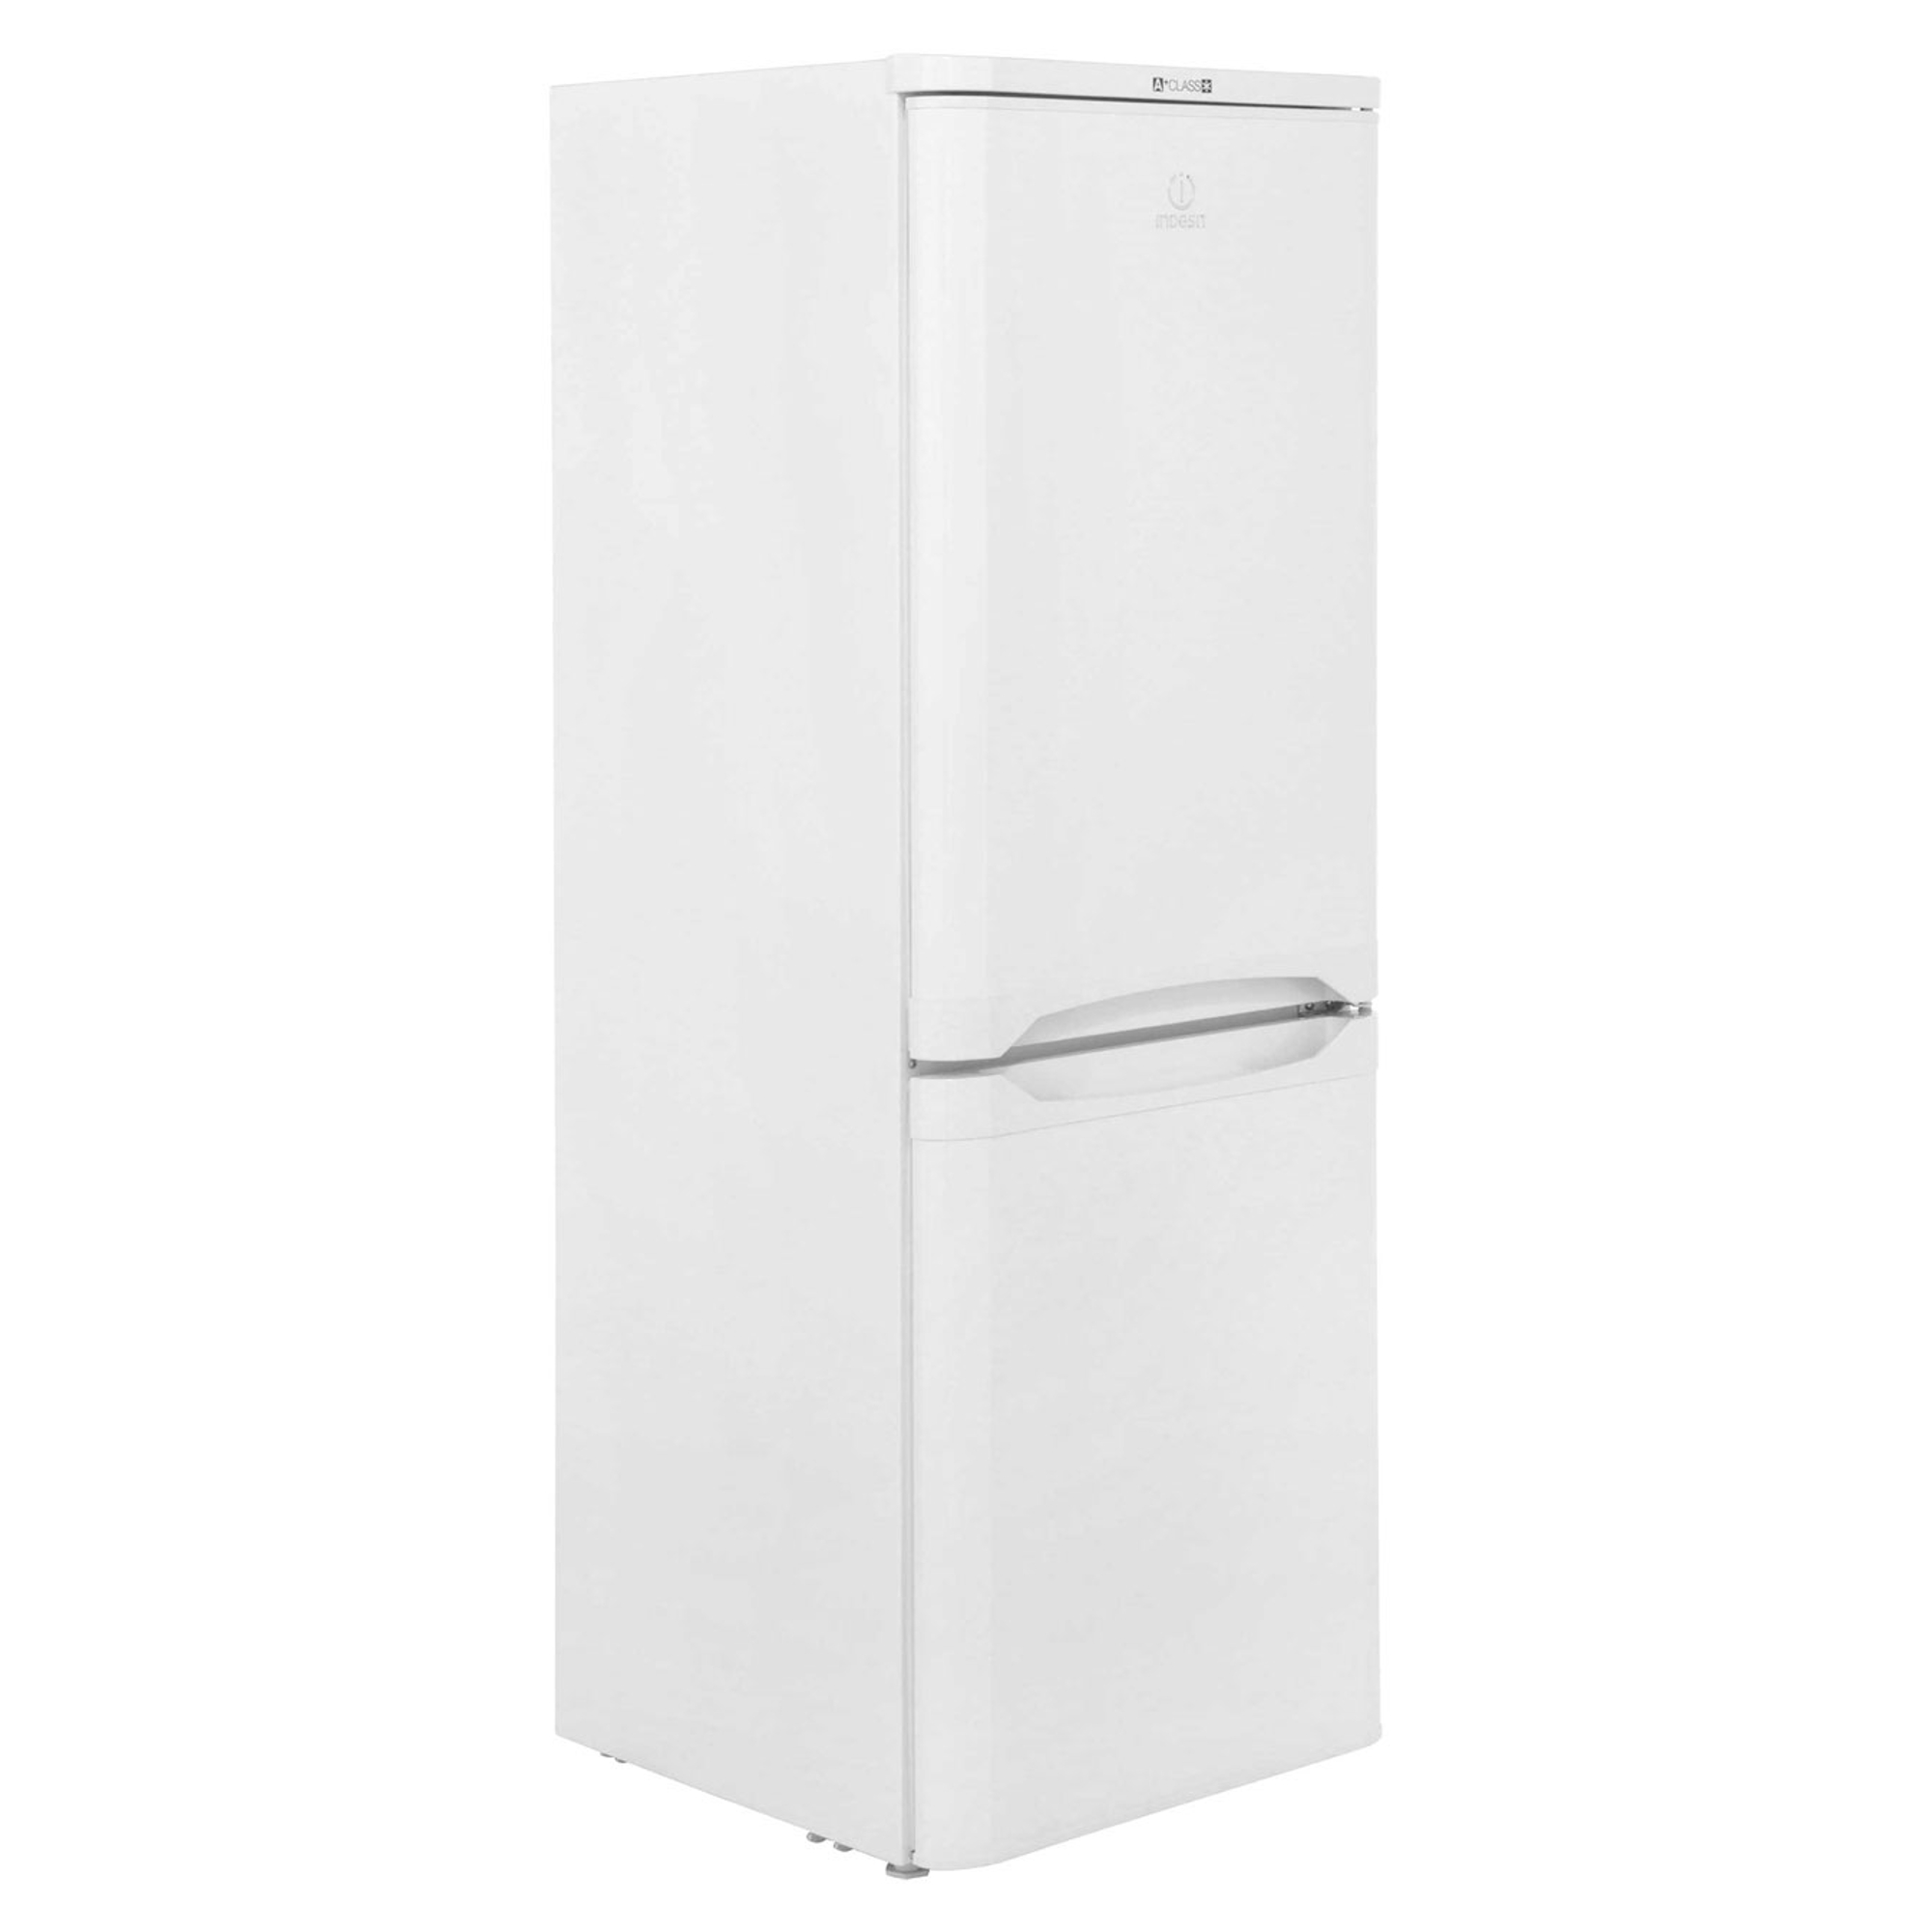 Indesit Ibd5515wuk Low Frost Fridge Freezer Hughes